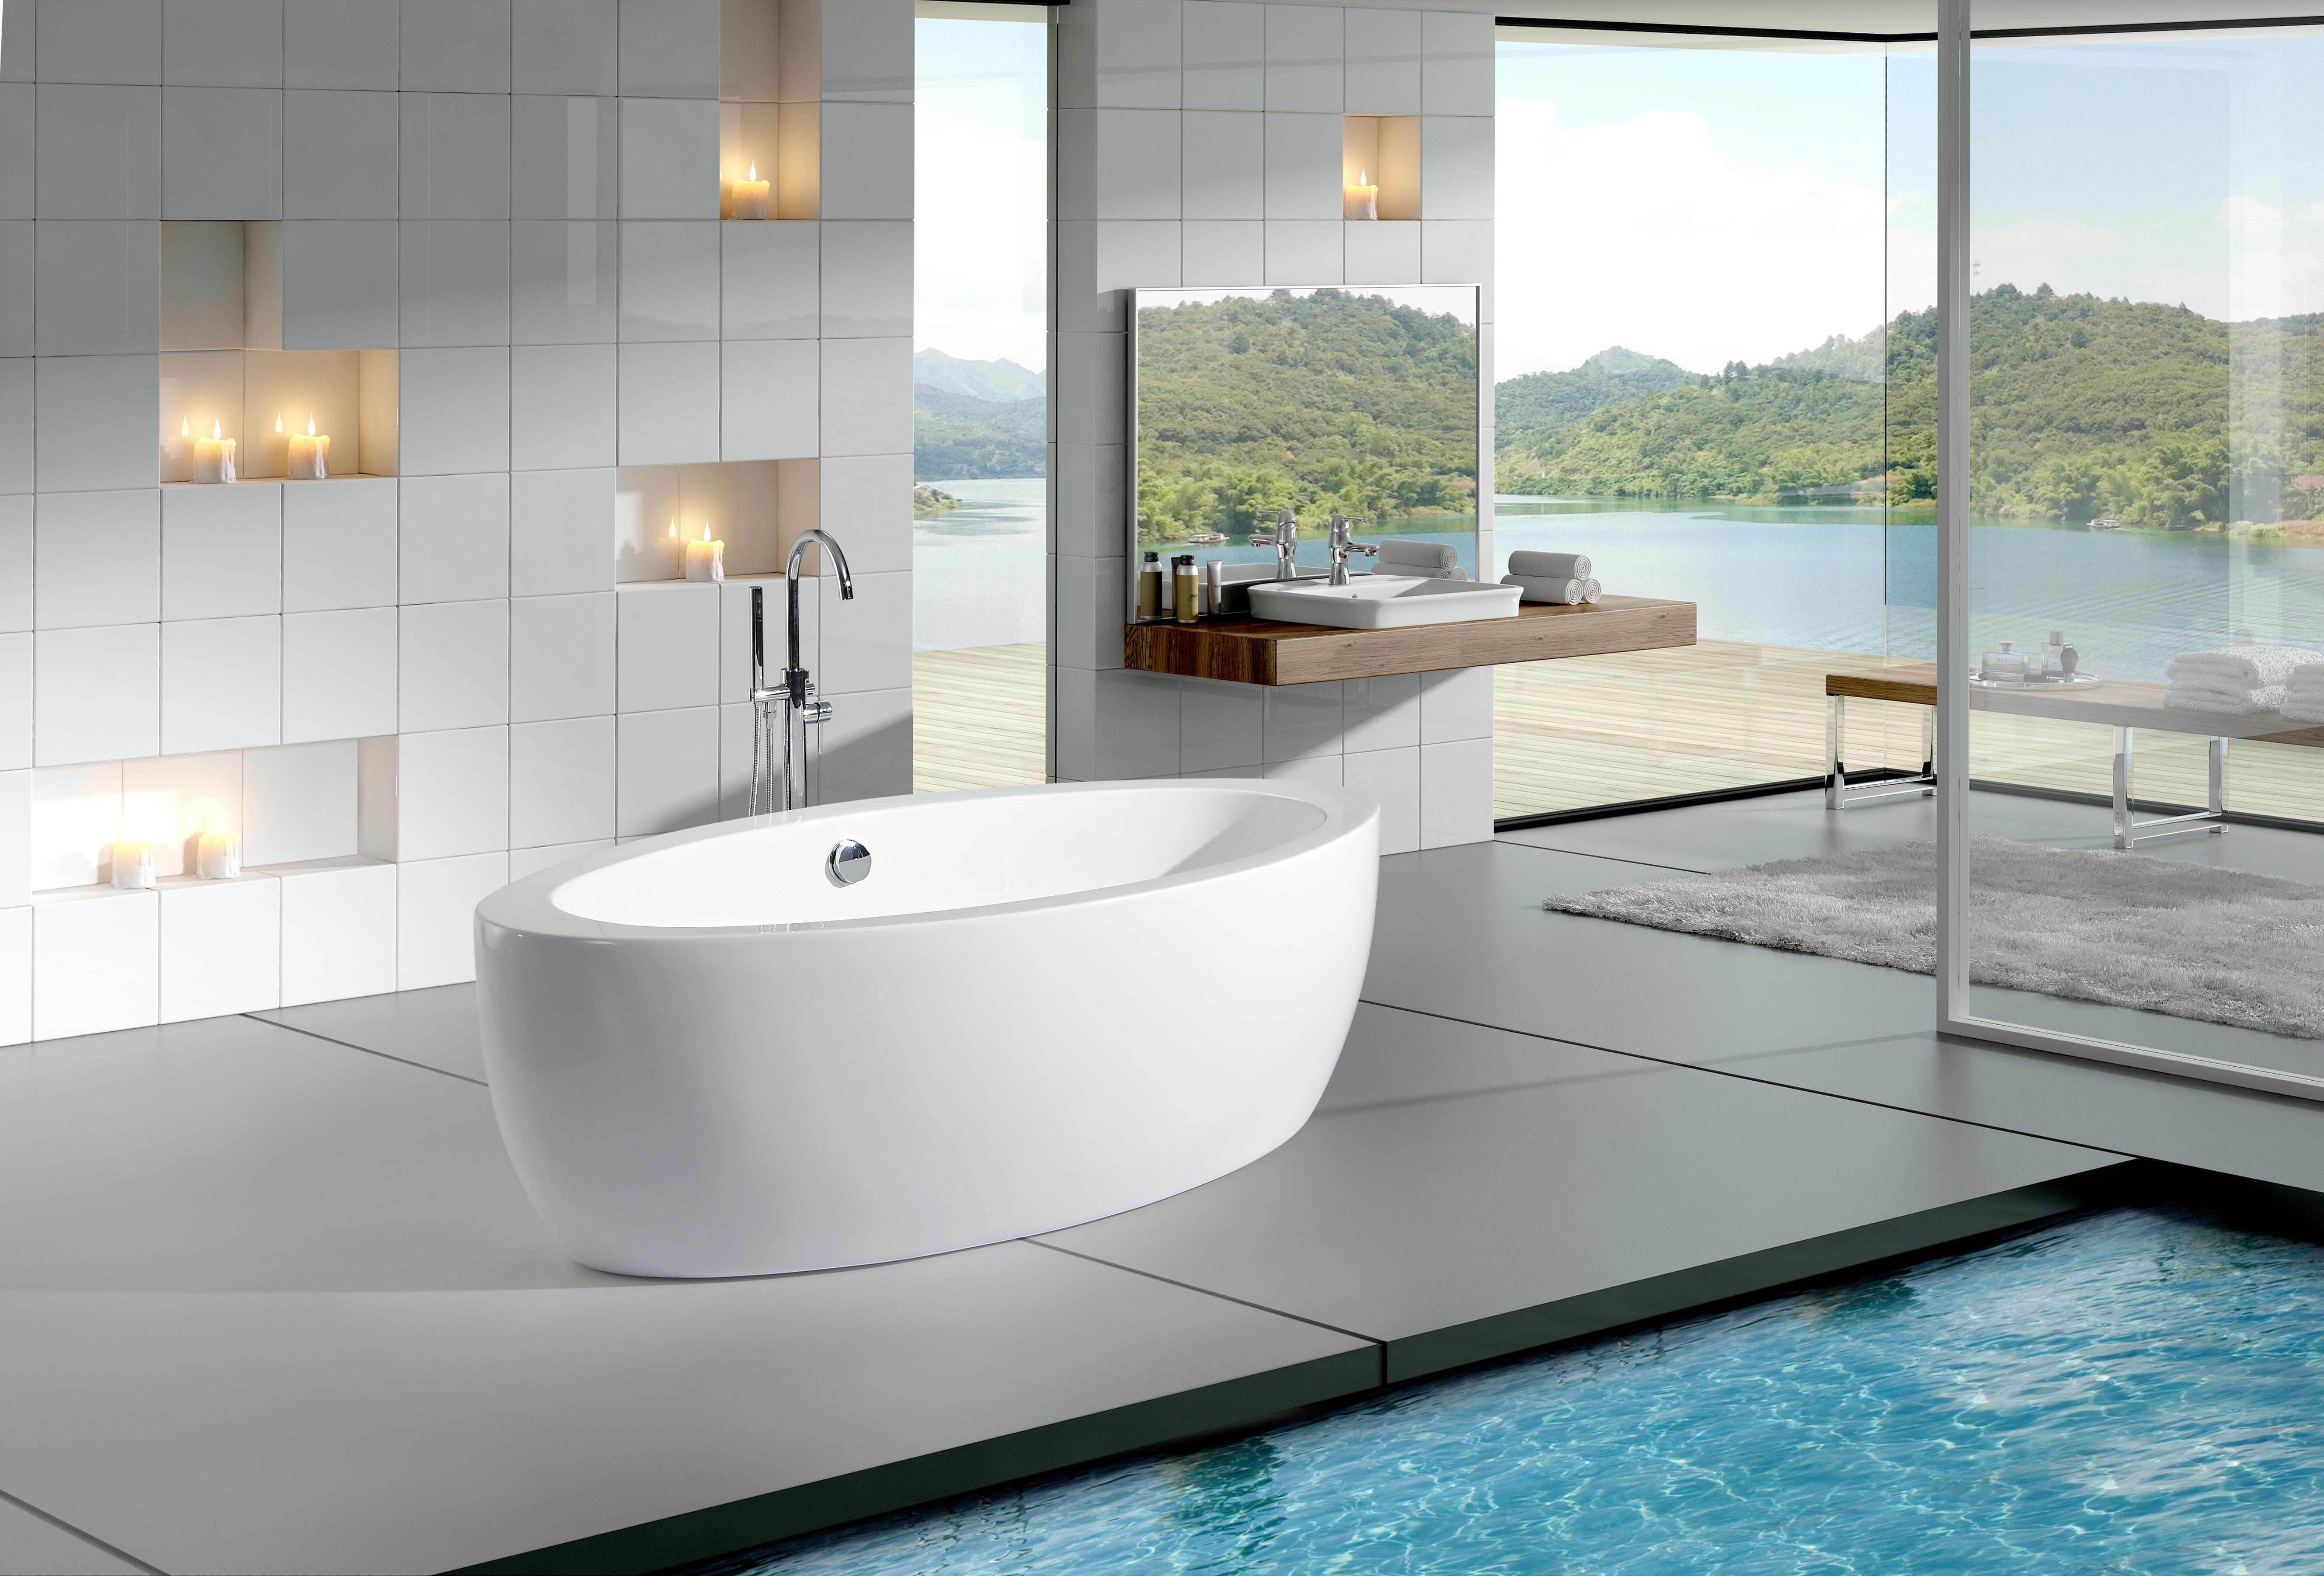 freestanding nice whirlpool luxury interior to tub alone stand jetted with bathtub tubs cdbossington bathtubs design pertaining